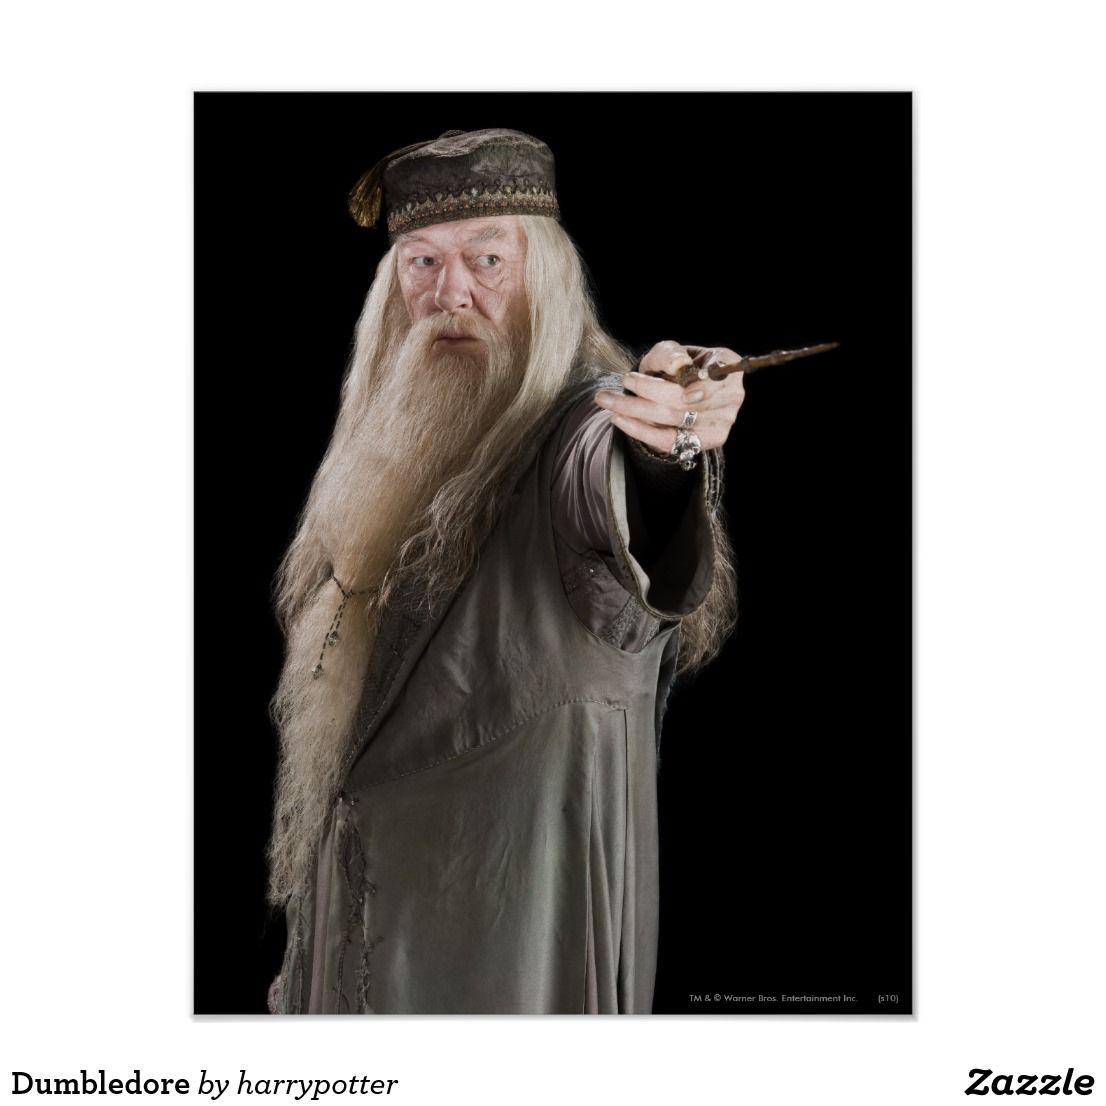 Dumbledore Poster Zazzle Com Harry Potter Dumbledore Albus Dumbledore Harry Potter Harry Potter Witch